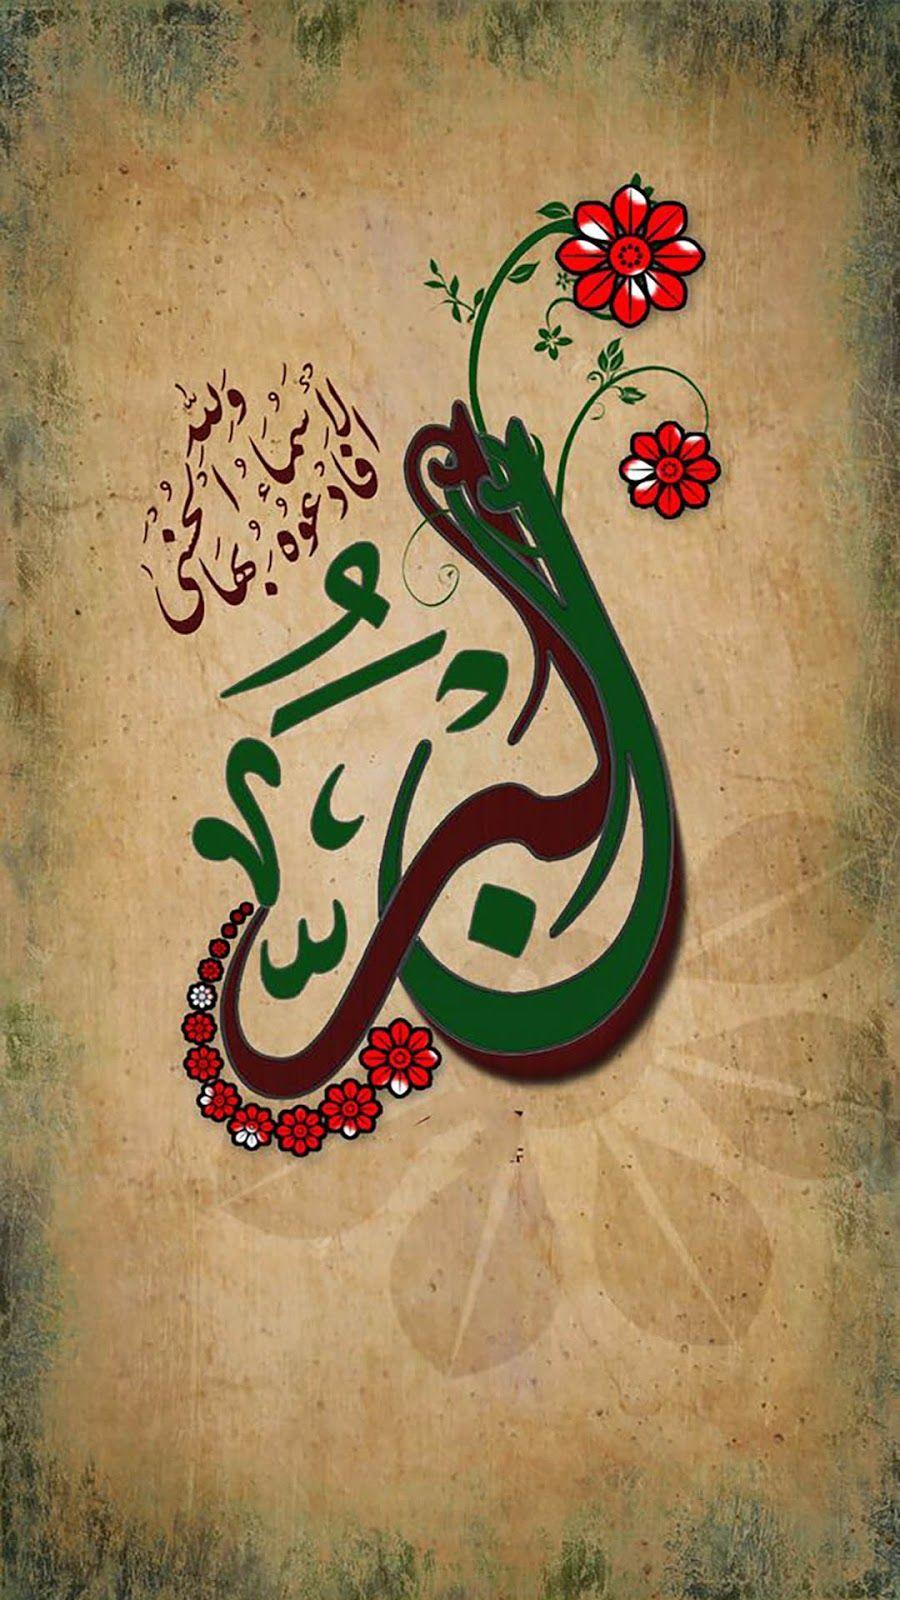 Kaligrafi di 2020 Seni kaligrafi, Seni, dan Kaligrafi arab